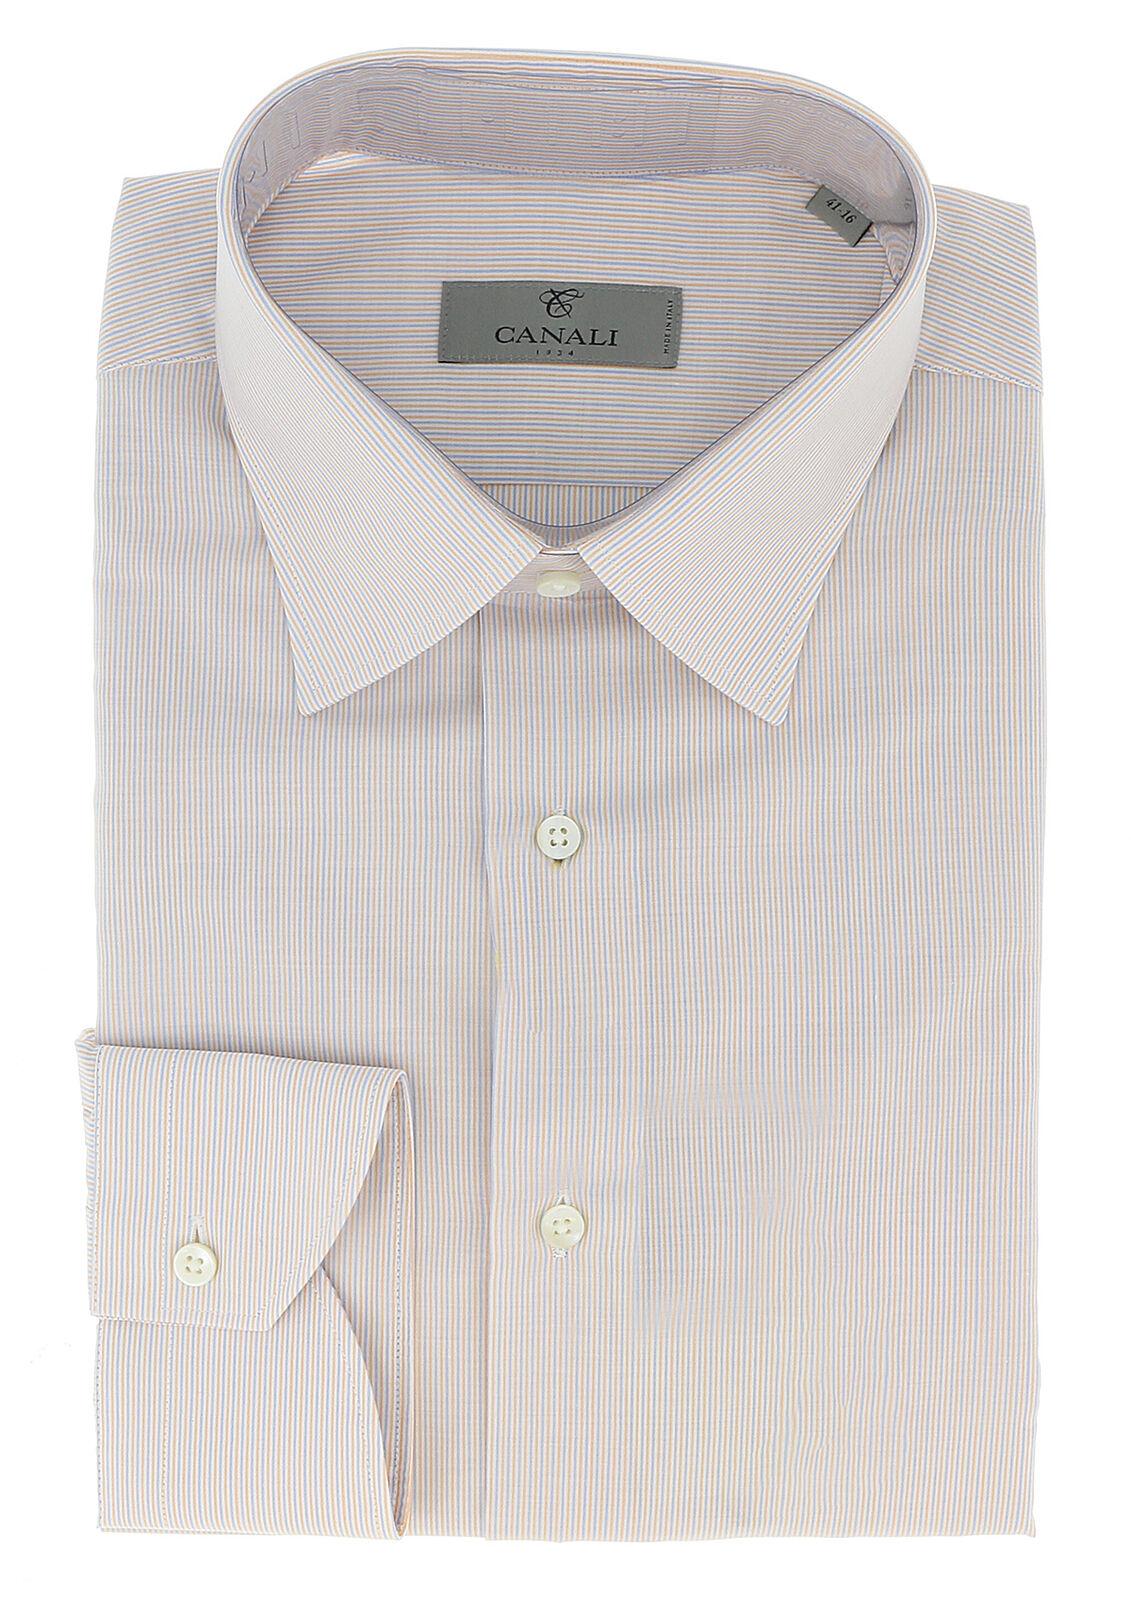 Canali bluee Peach Stripe Formal Shirts